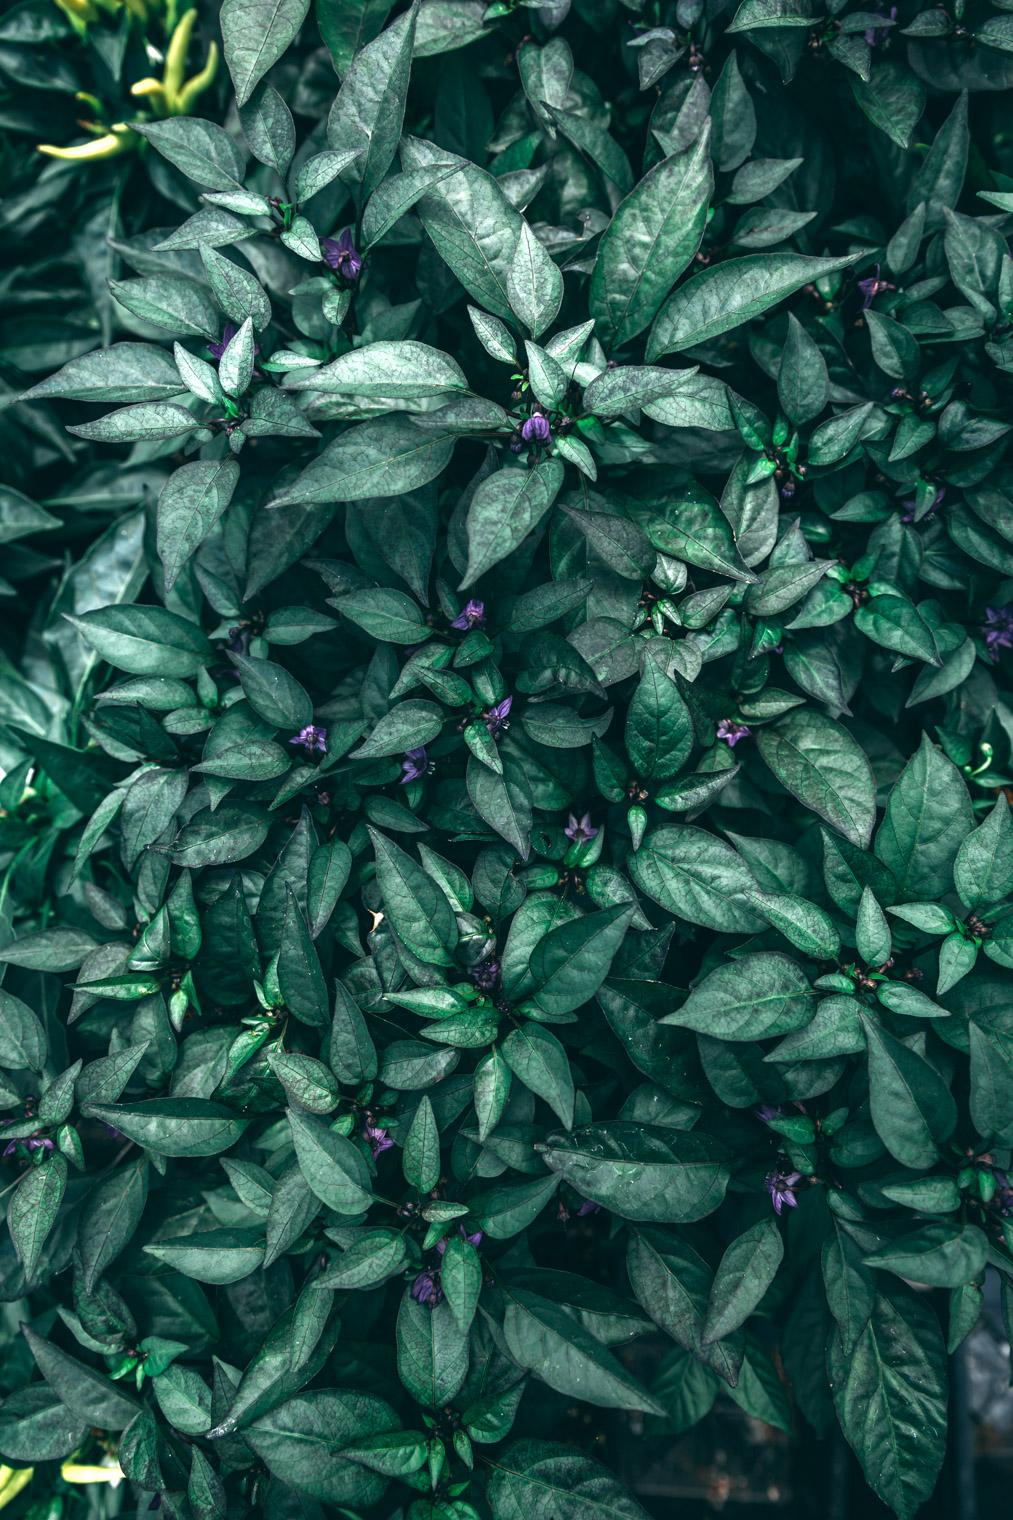 My Tips & Tricks For Planting an Edible Garden